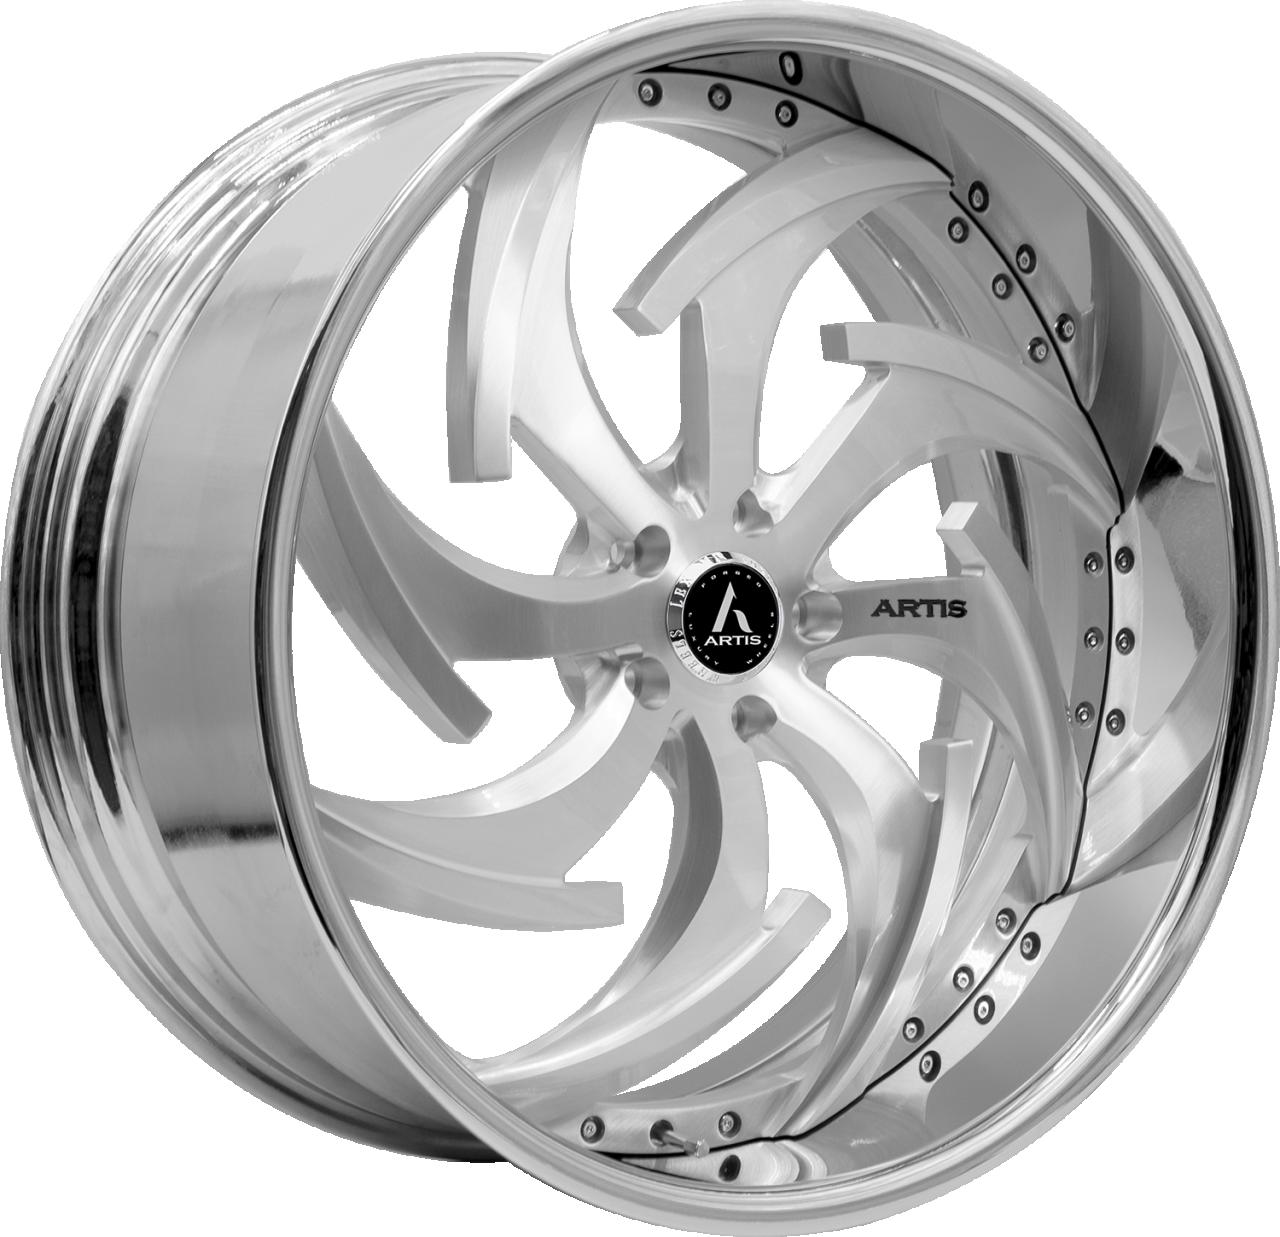 Artis Forged Dagger wheel with Brushed finish